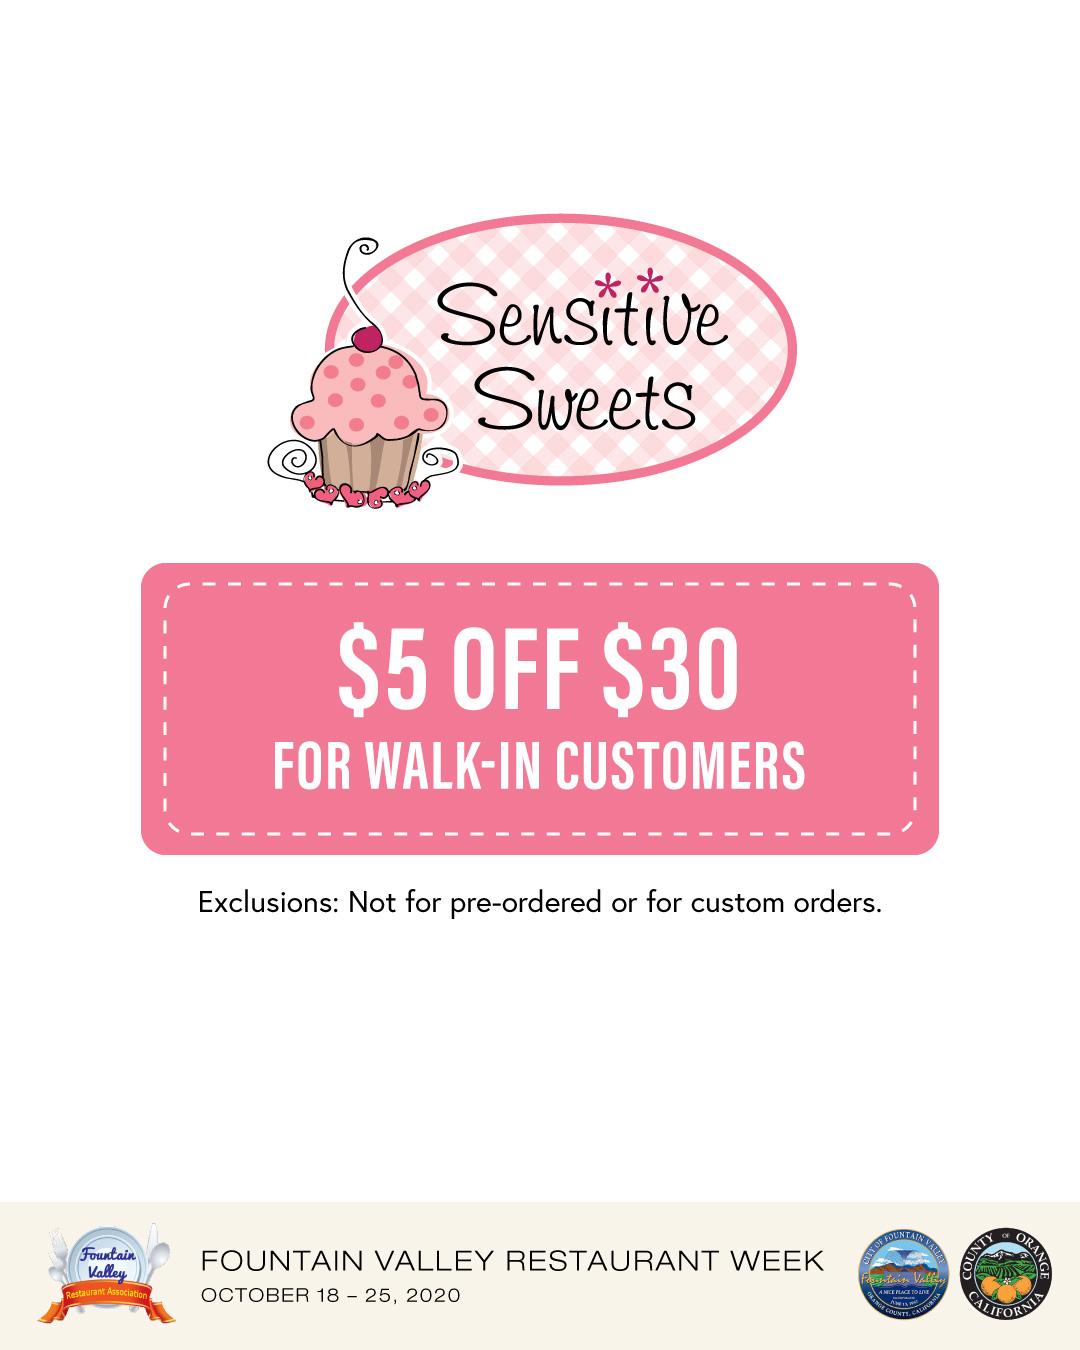 Sensitive Sweets